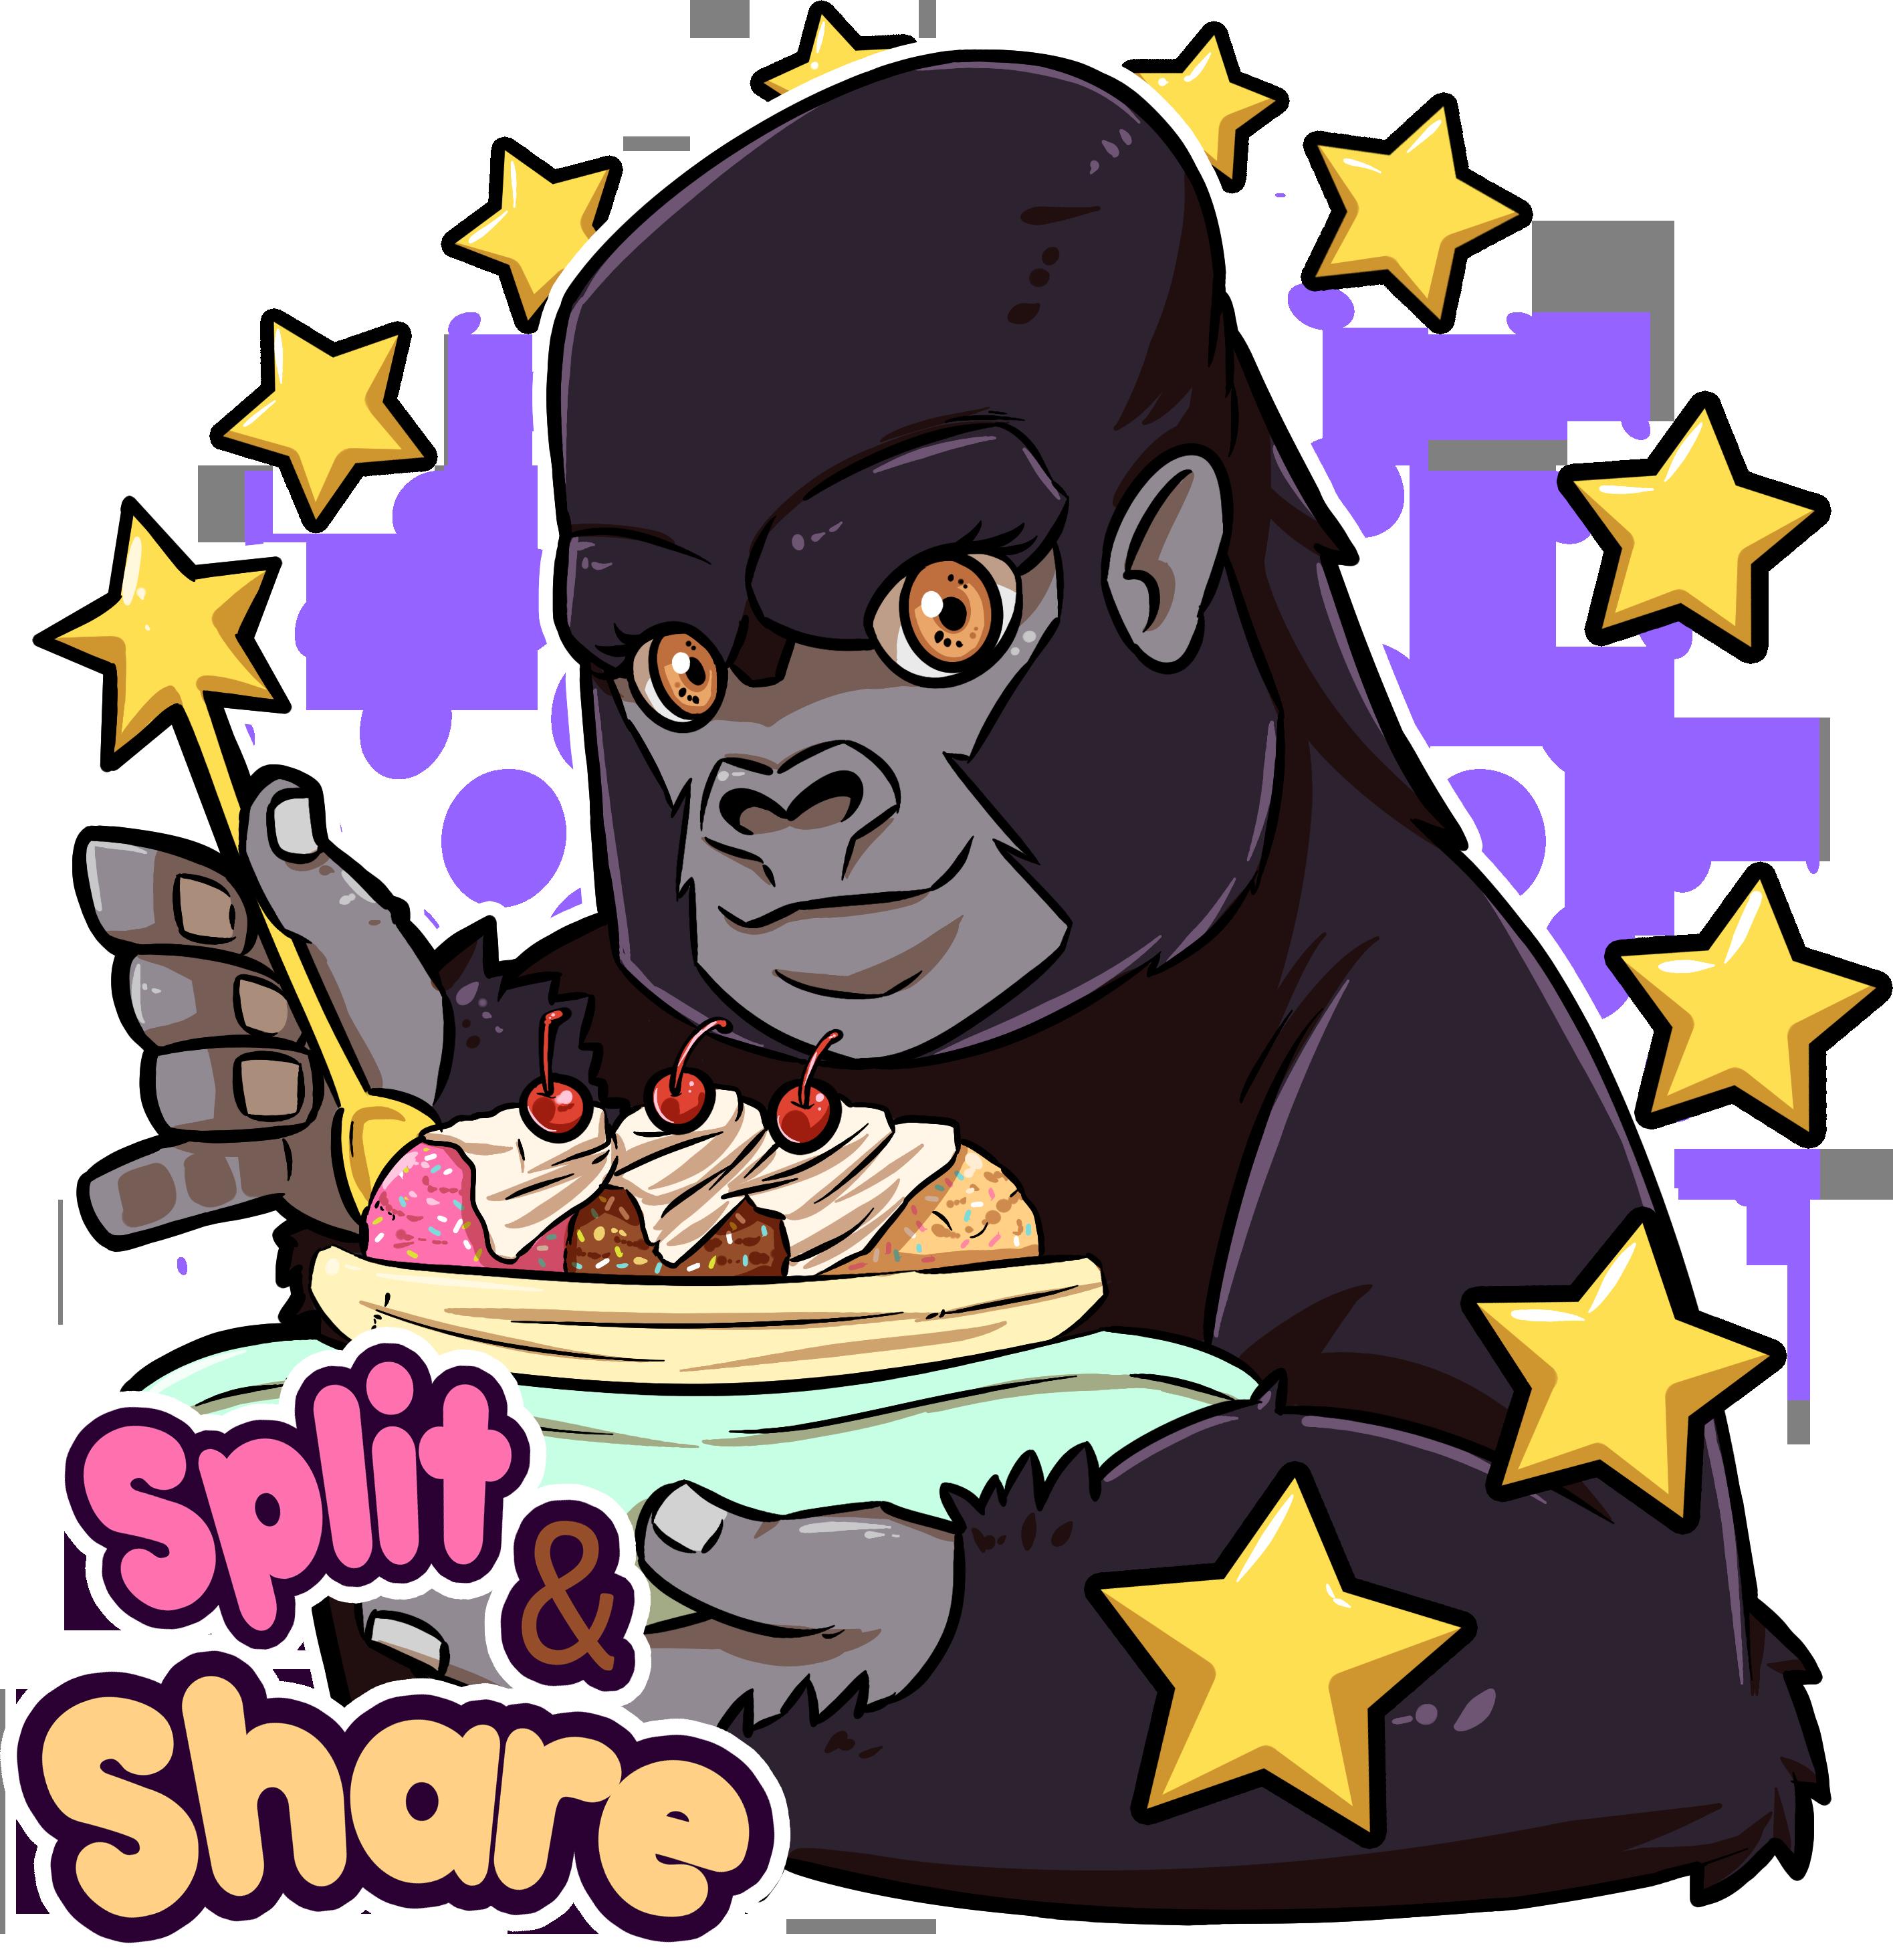 graphic free Split nicoy guevarra . Gorilla clipart banana